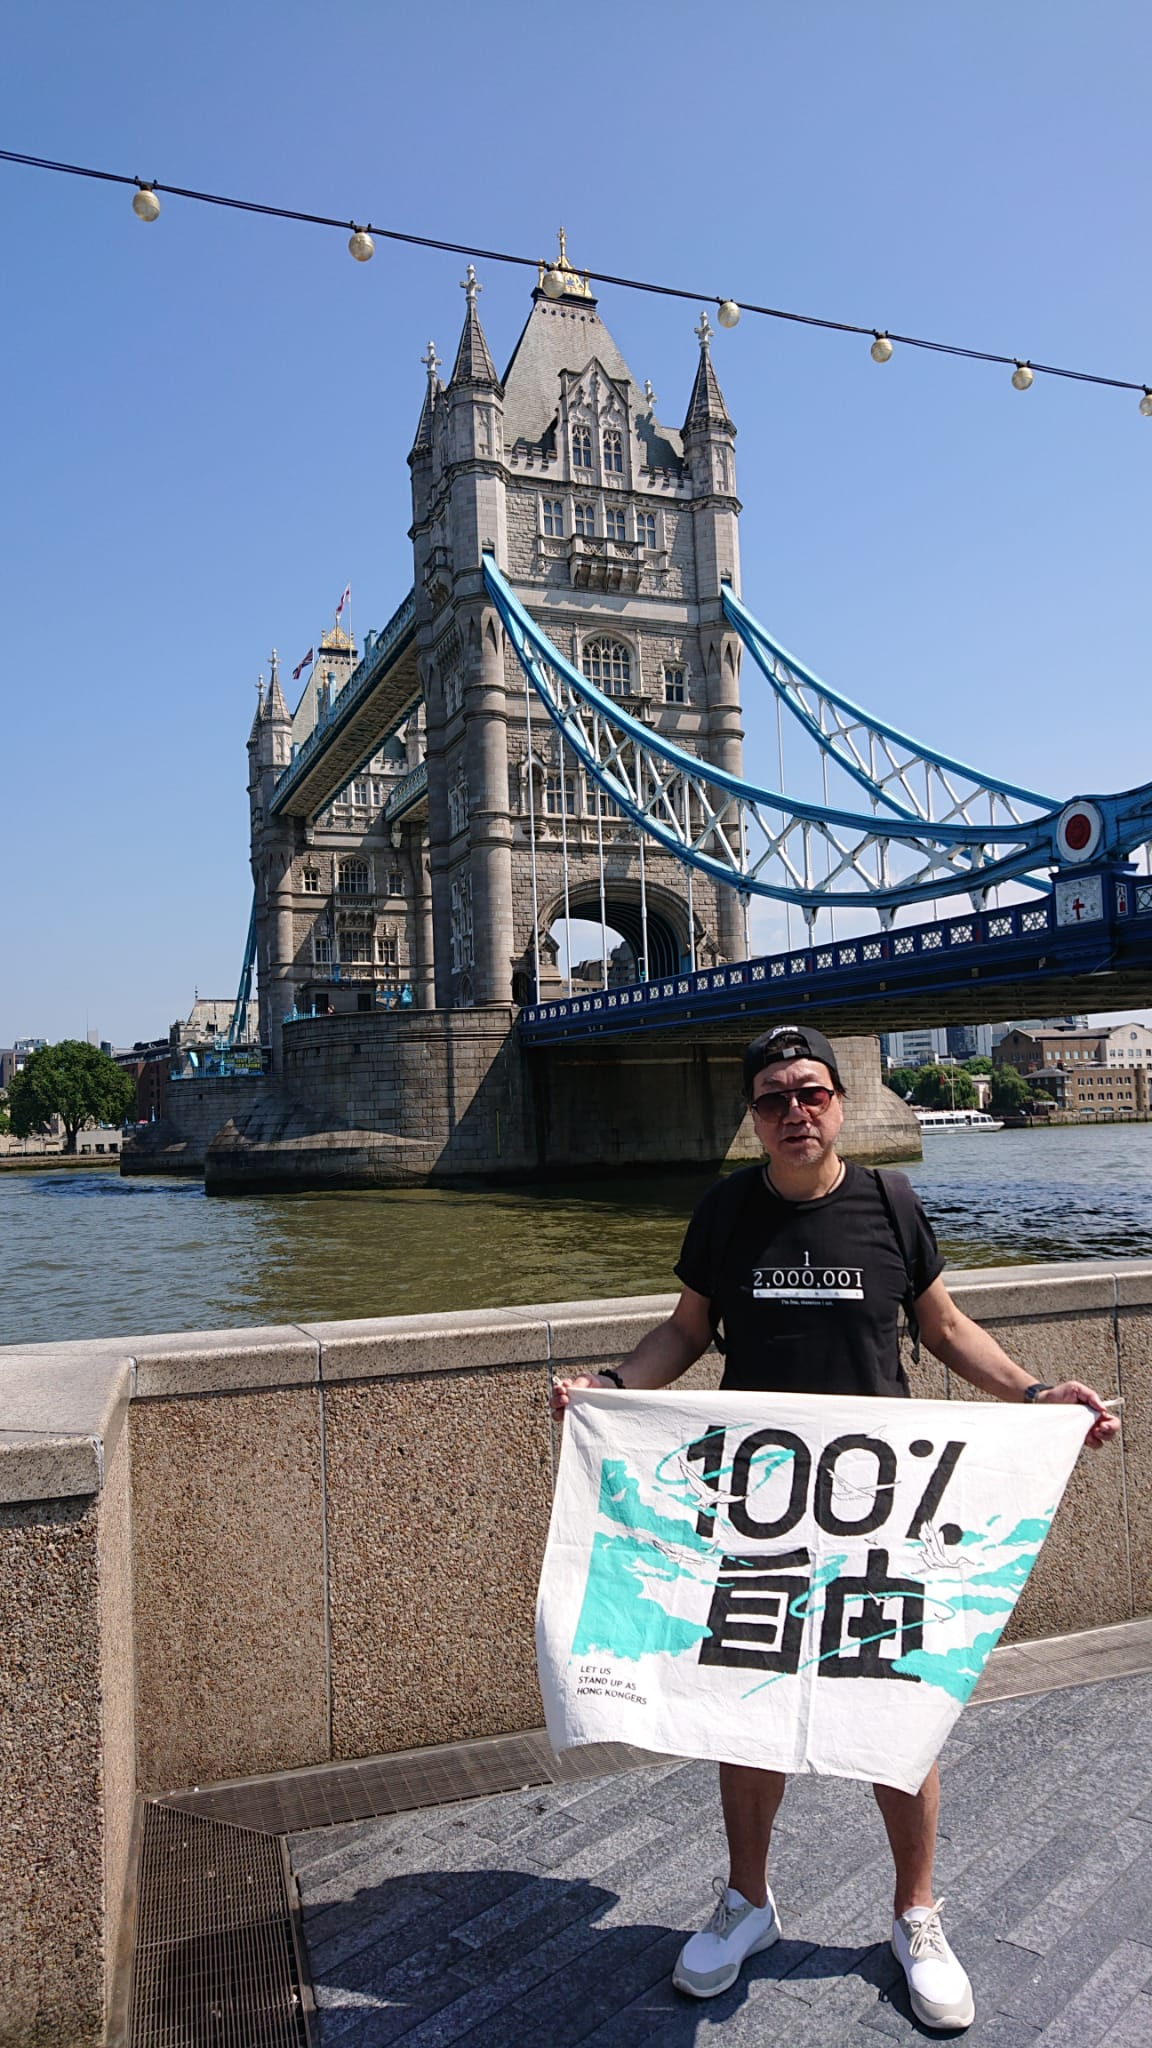 手持「100% 自由 、Let Us Stand Up As Hong Kongers」攝影於倫敦橋底。(受訪者提供)